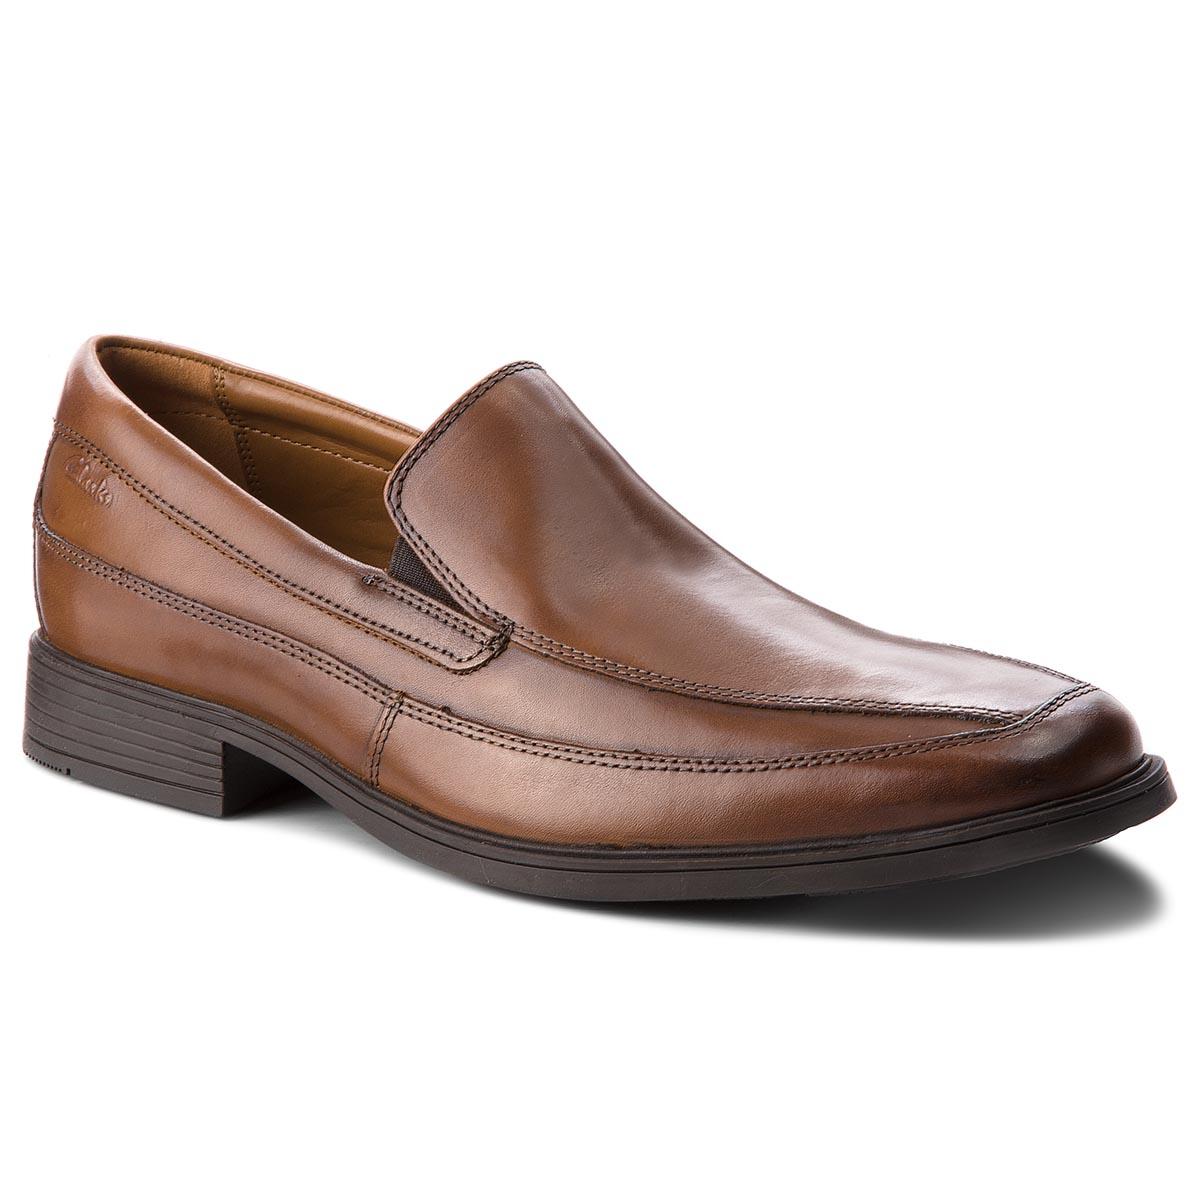 93aa9e31fe4 Κλειστά παπούτσια CLARKS - Tilden Free 261300987 Dark Tan Leather ...